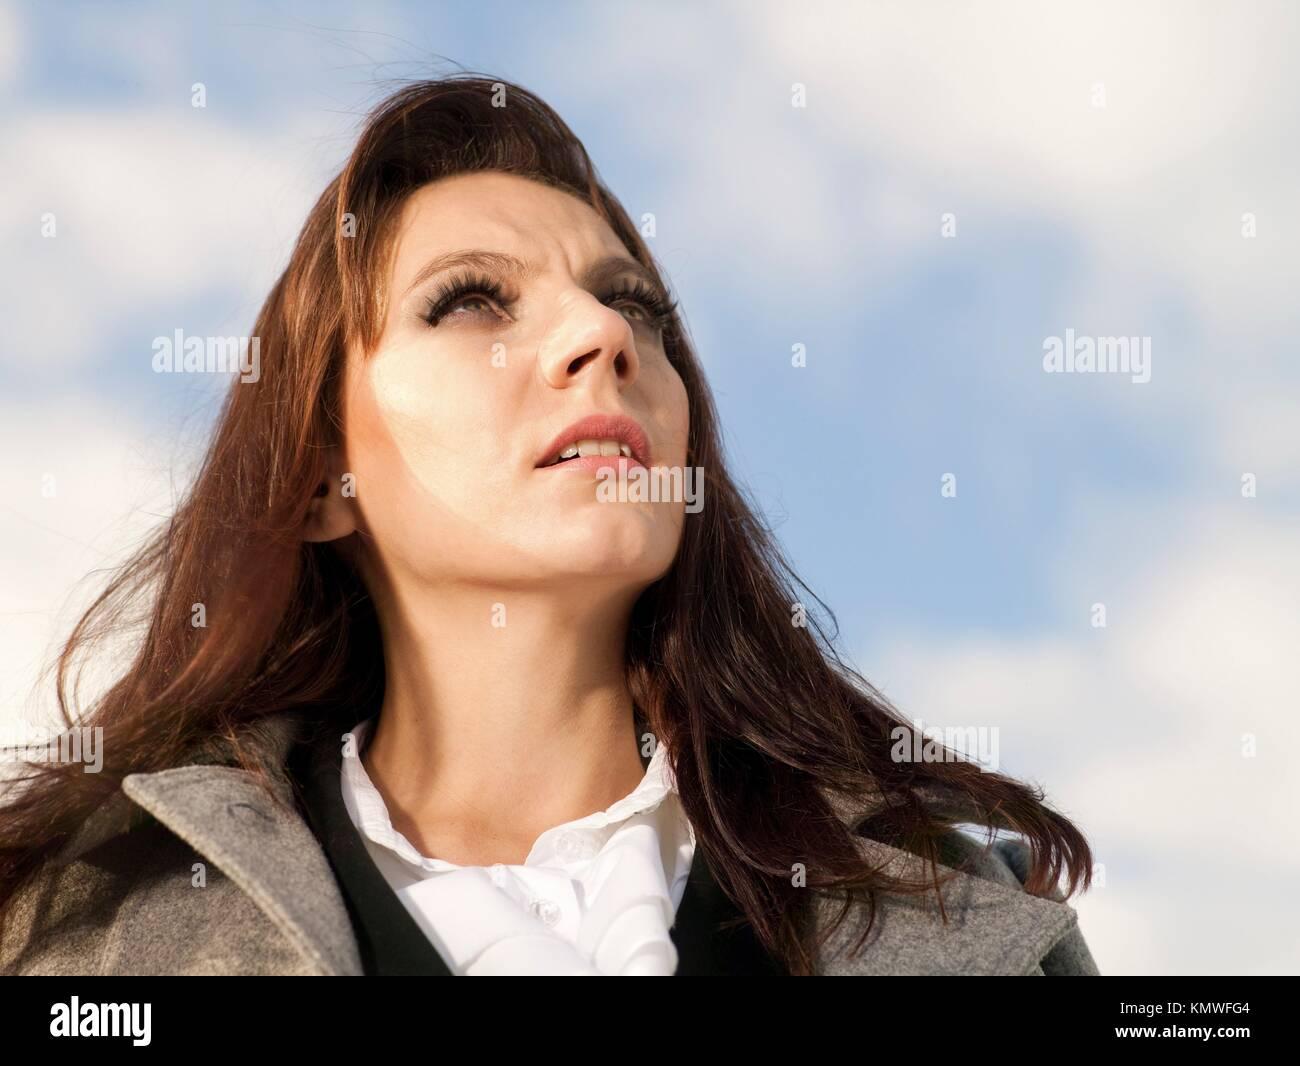 melancholy woman´s portrait under the blue skies - Stock Image